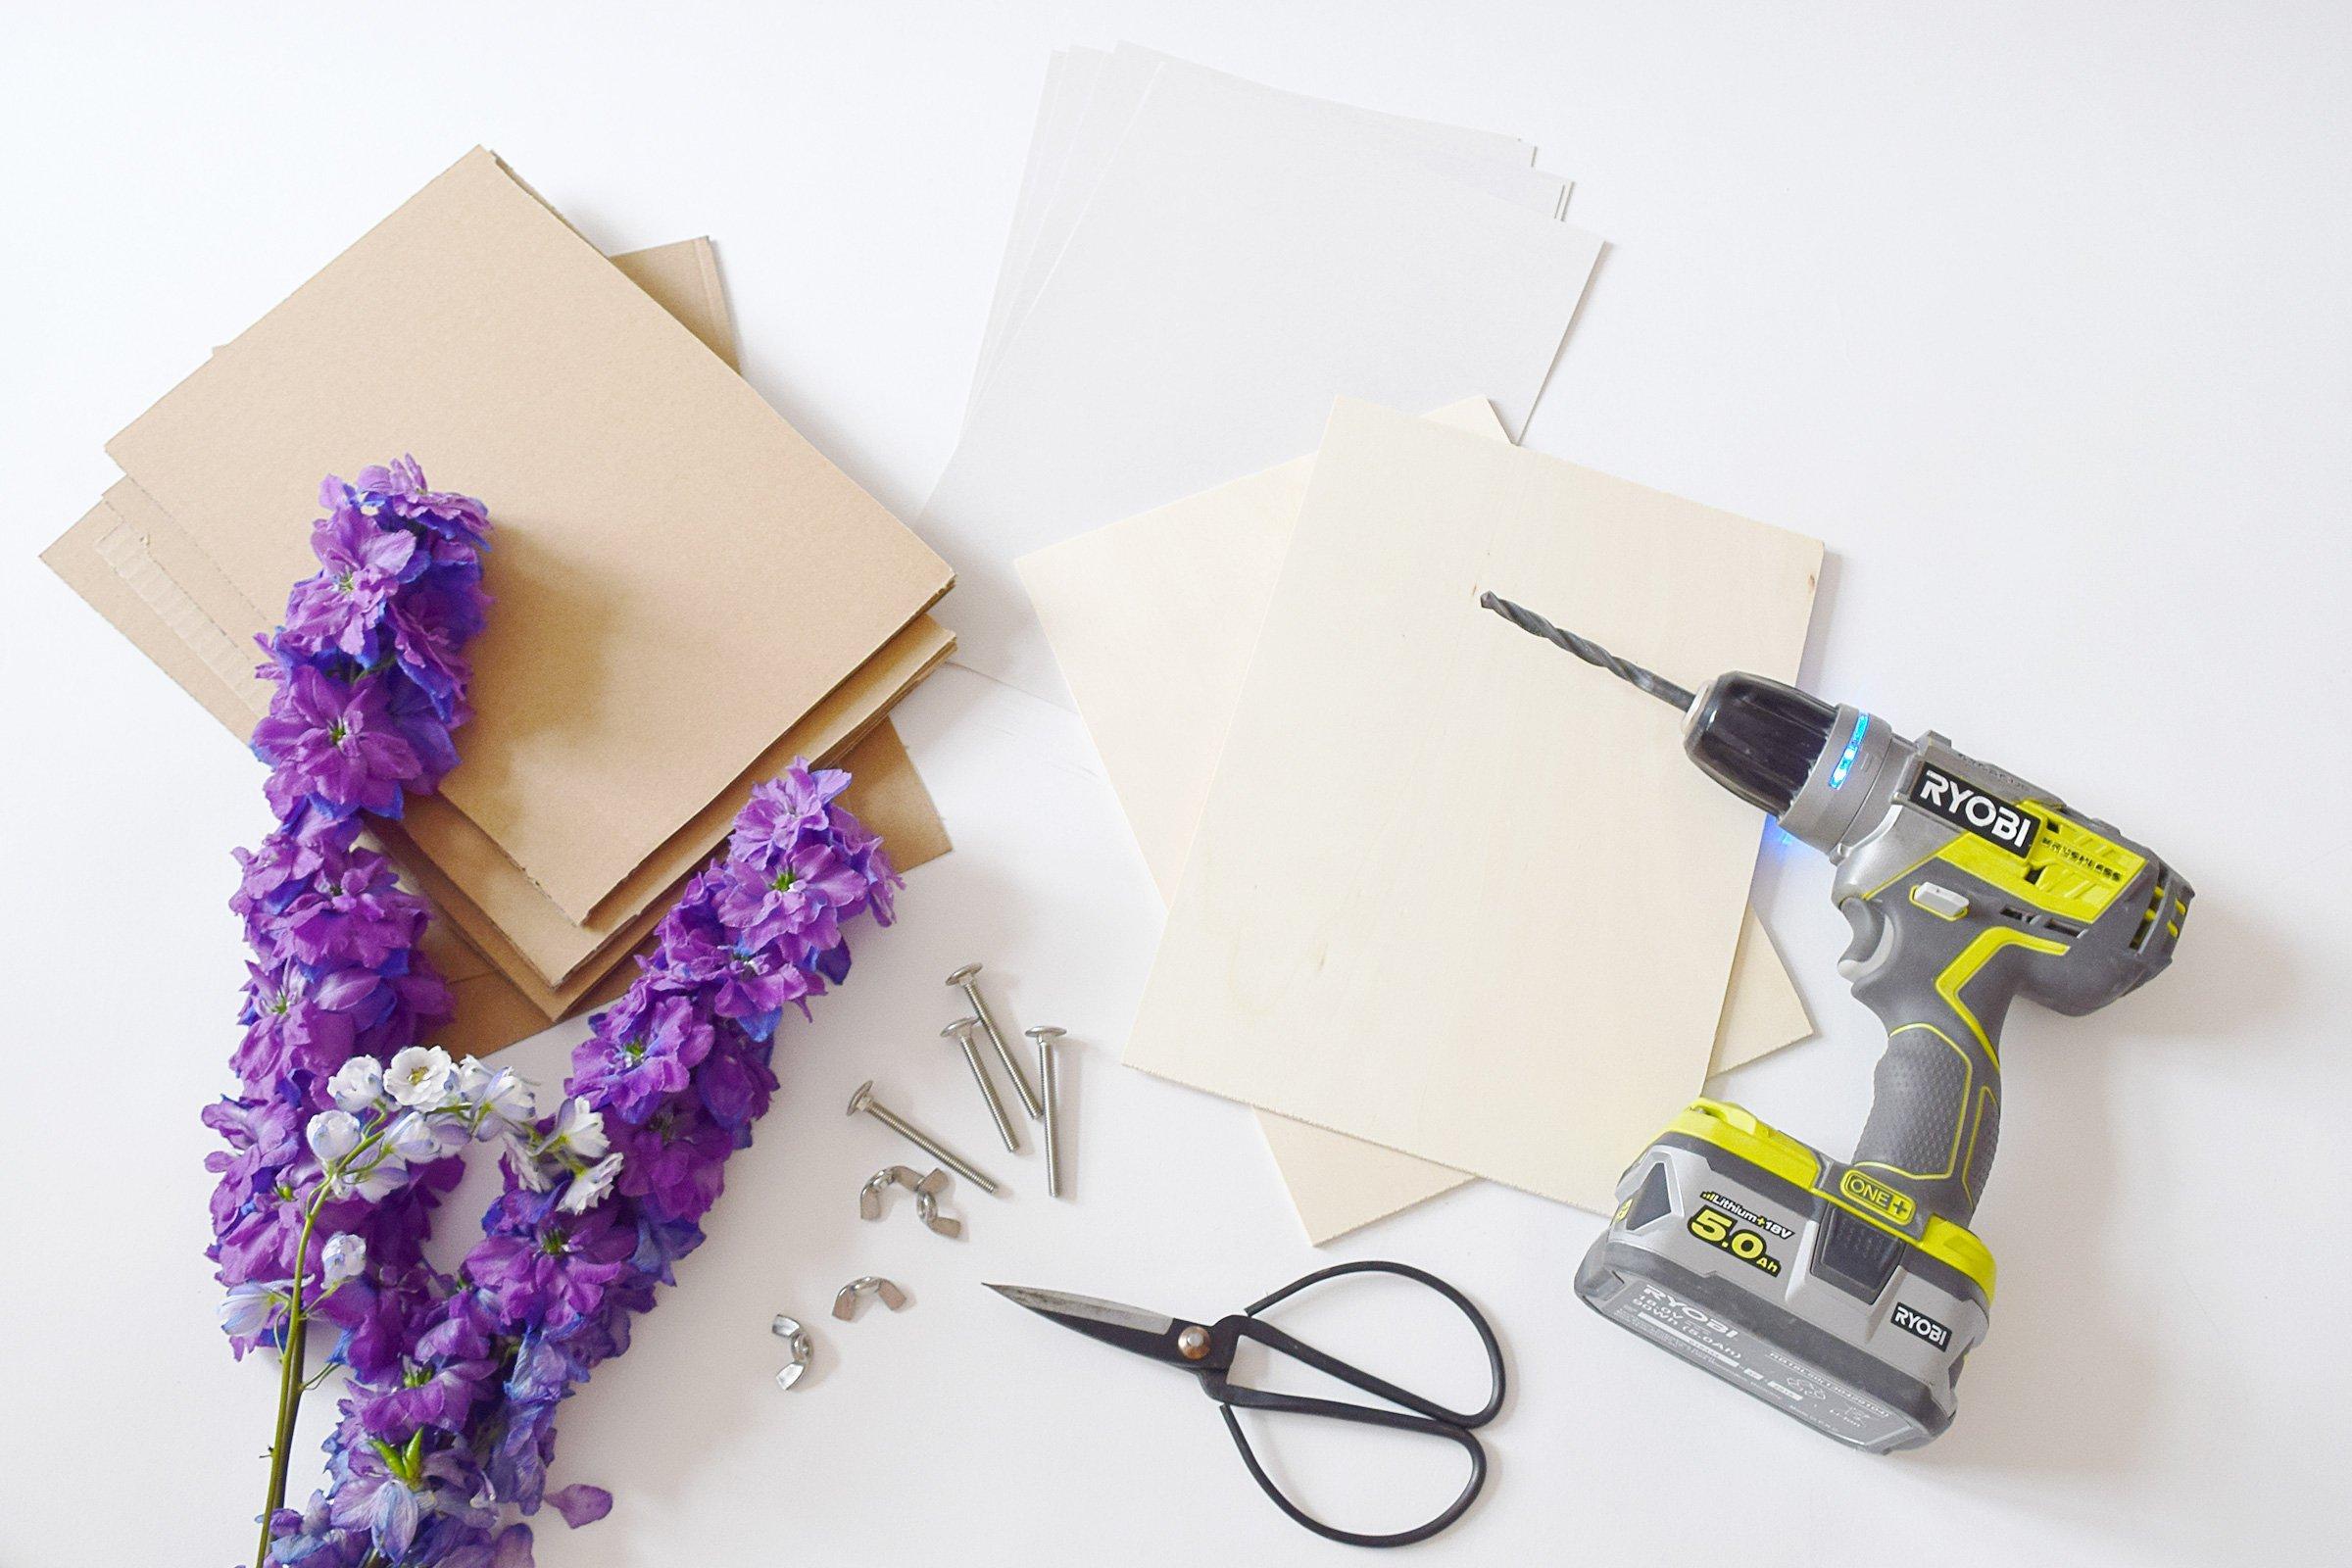 DIY Flower Press - Supplies | Little House On The Corner